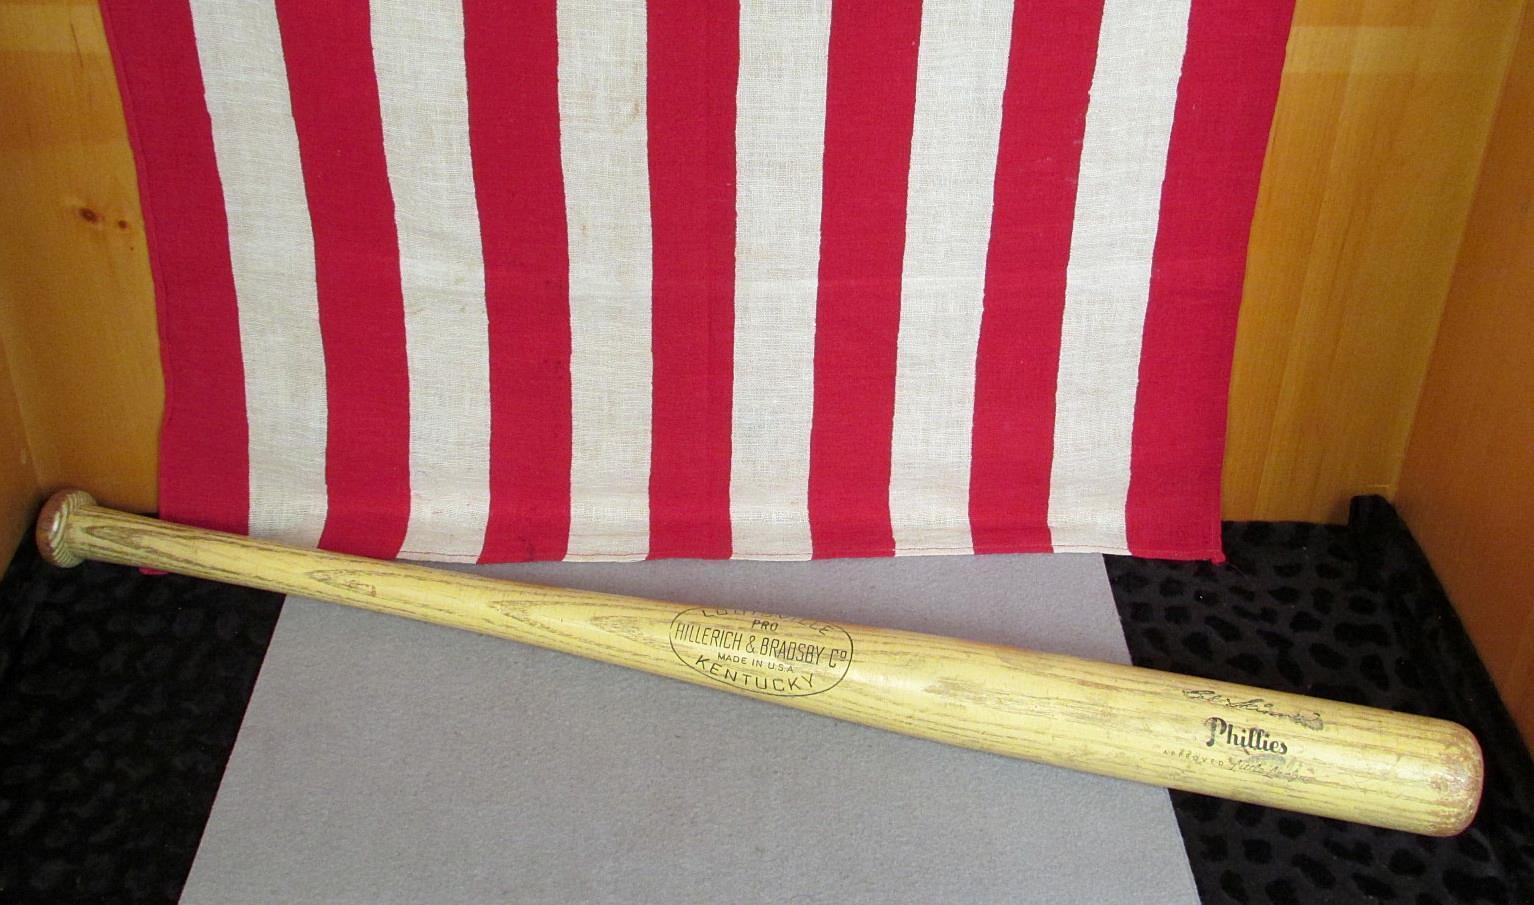 Vintage Bradsby Hillerich & Bradsby Vintage Holz Baseballschläger pro Bob Skinner Phillies 30